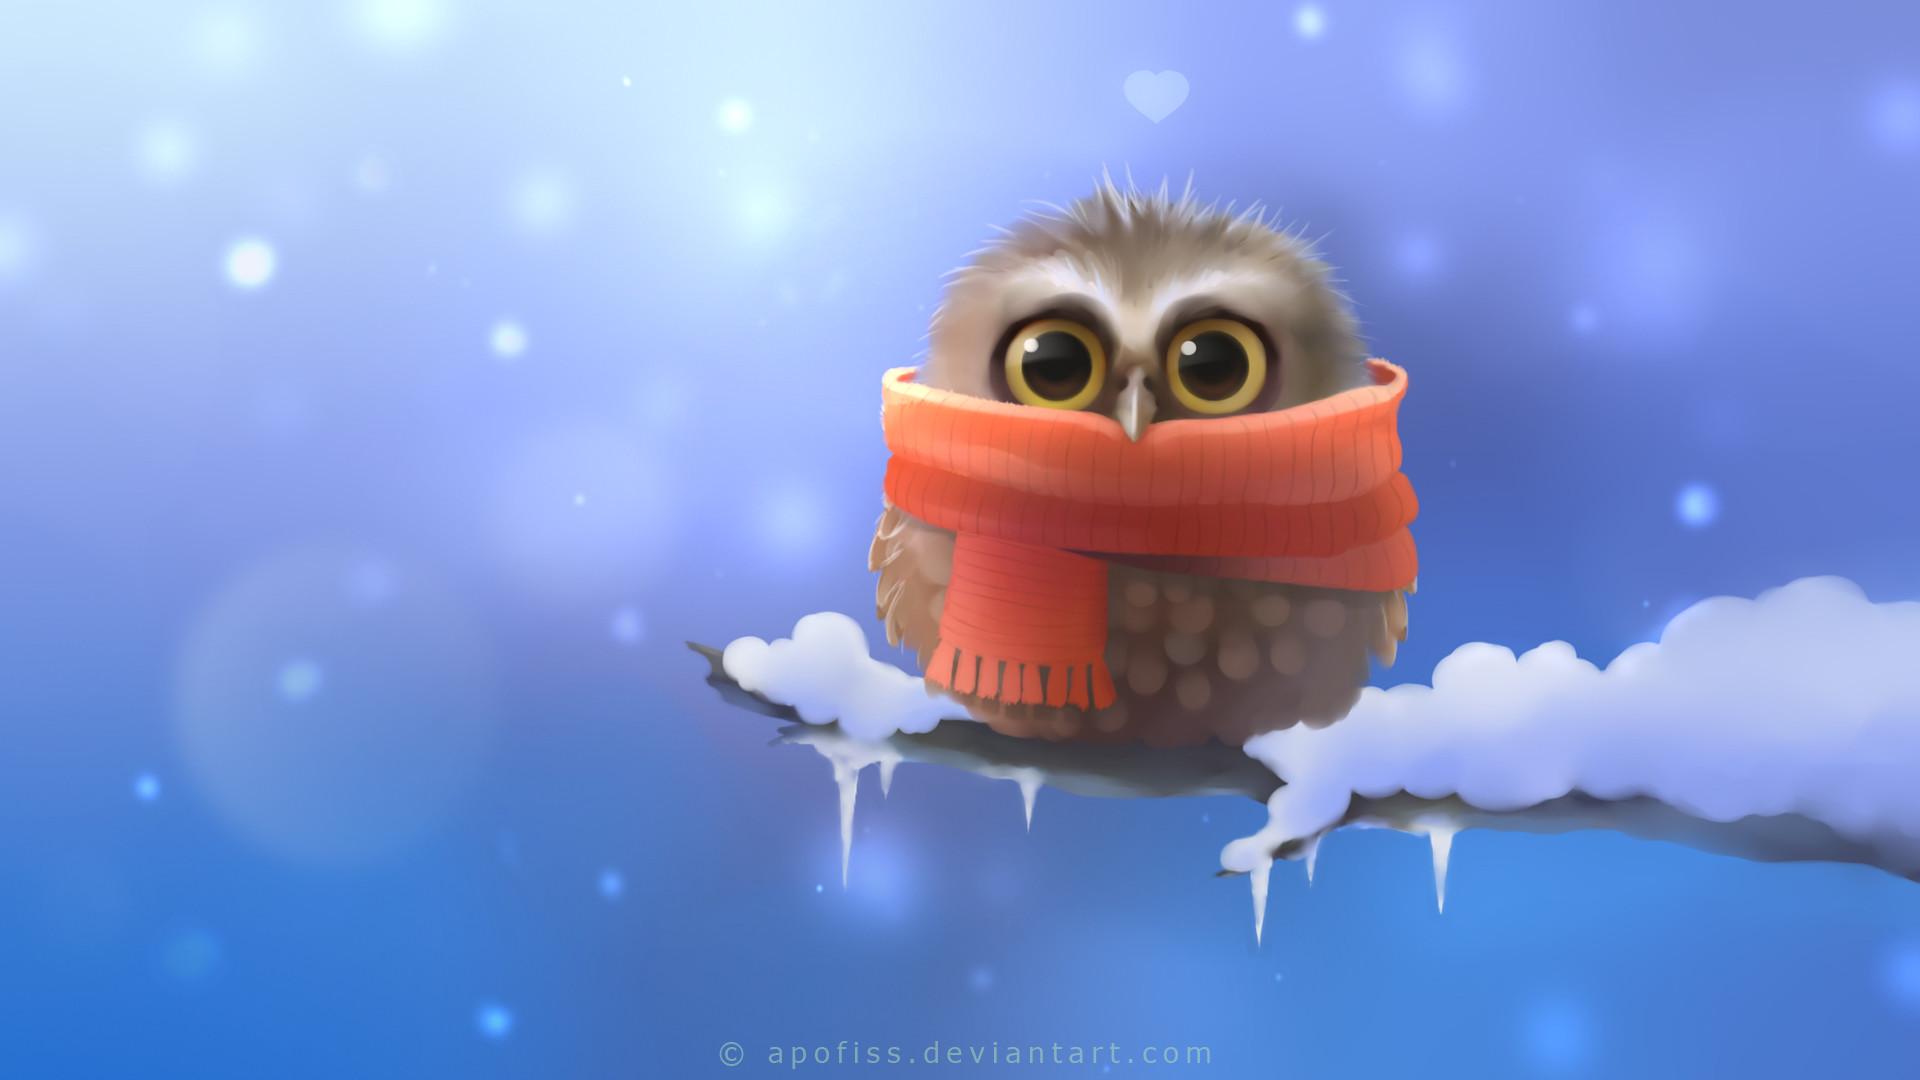 Res: 1920x1080, Cute Owl